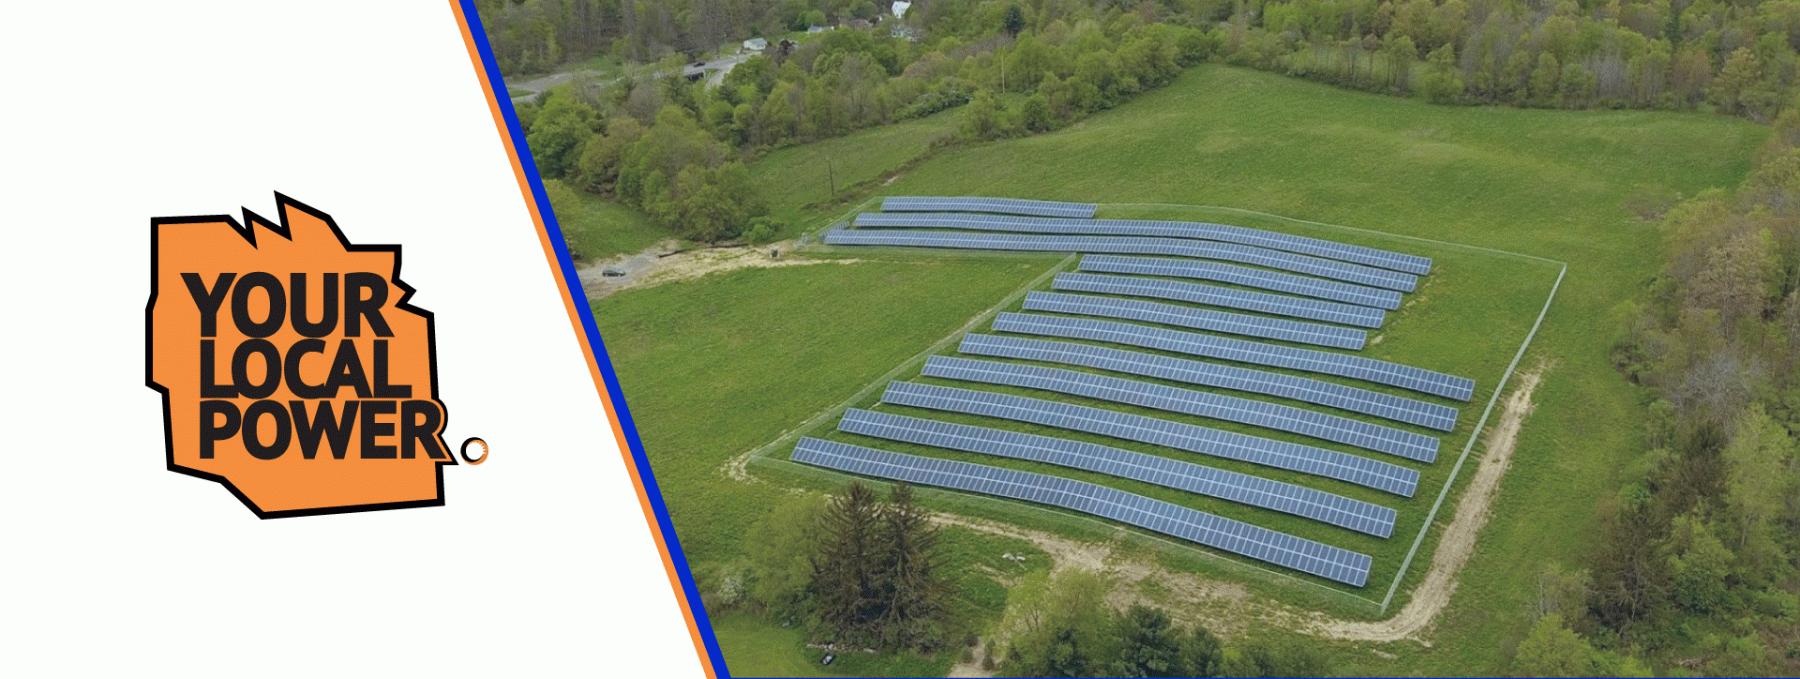 Community solar farm built by Renovus Solar